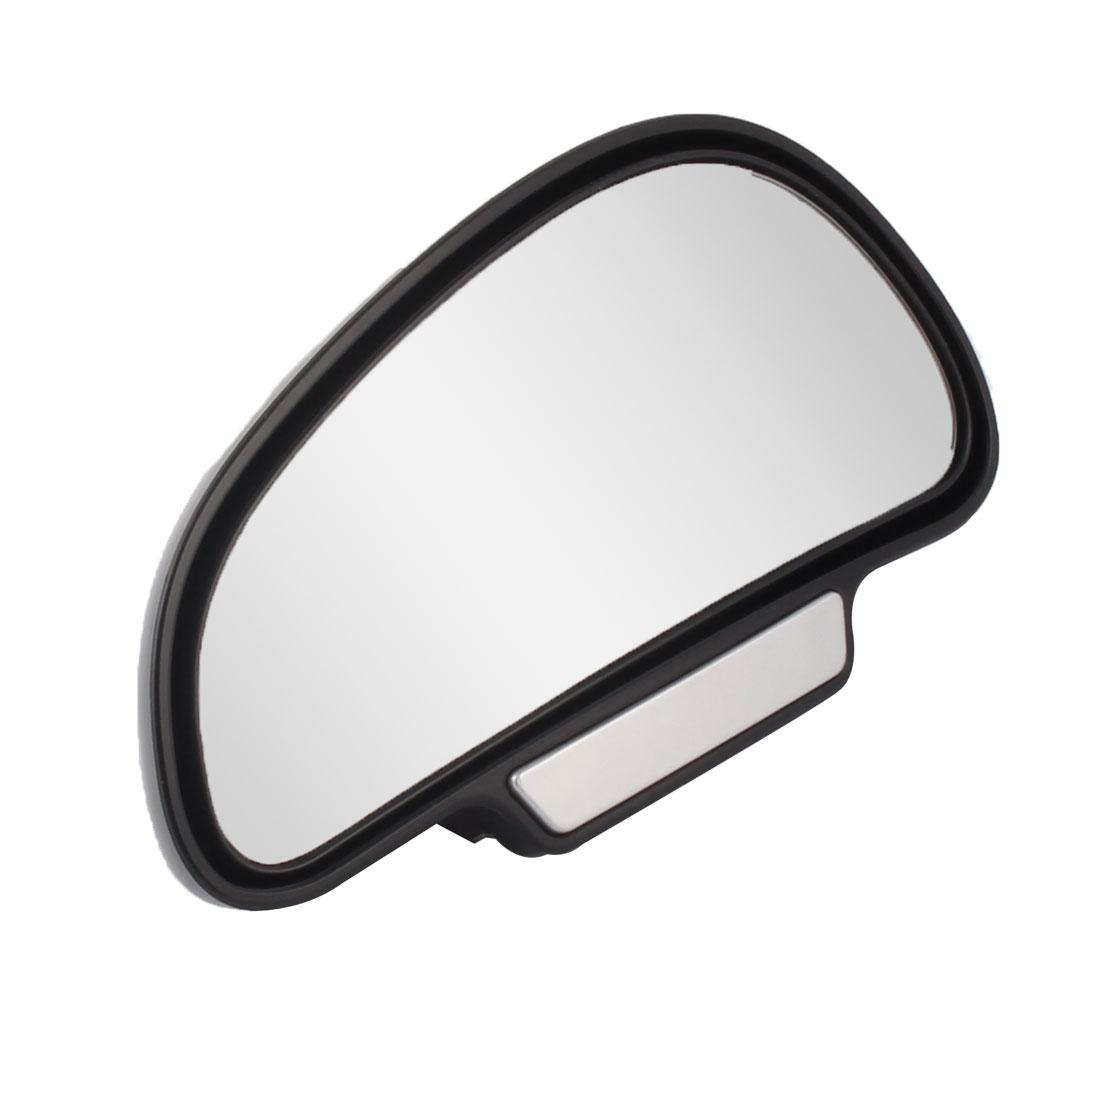 Auto SUV Universal Interior Rear View Convex Wide Angle Side Blind Spot Mirror